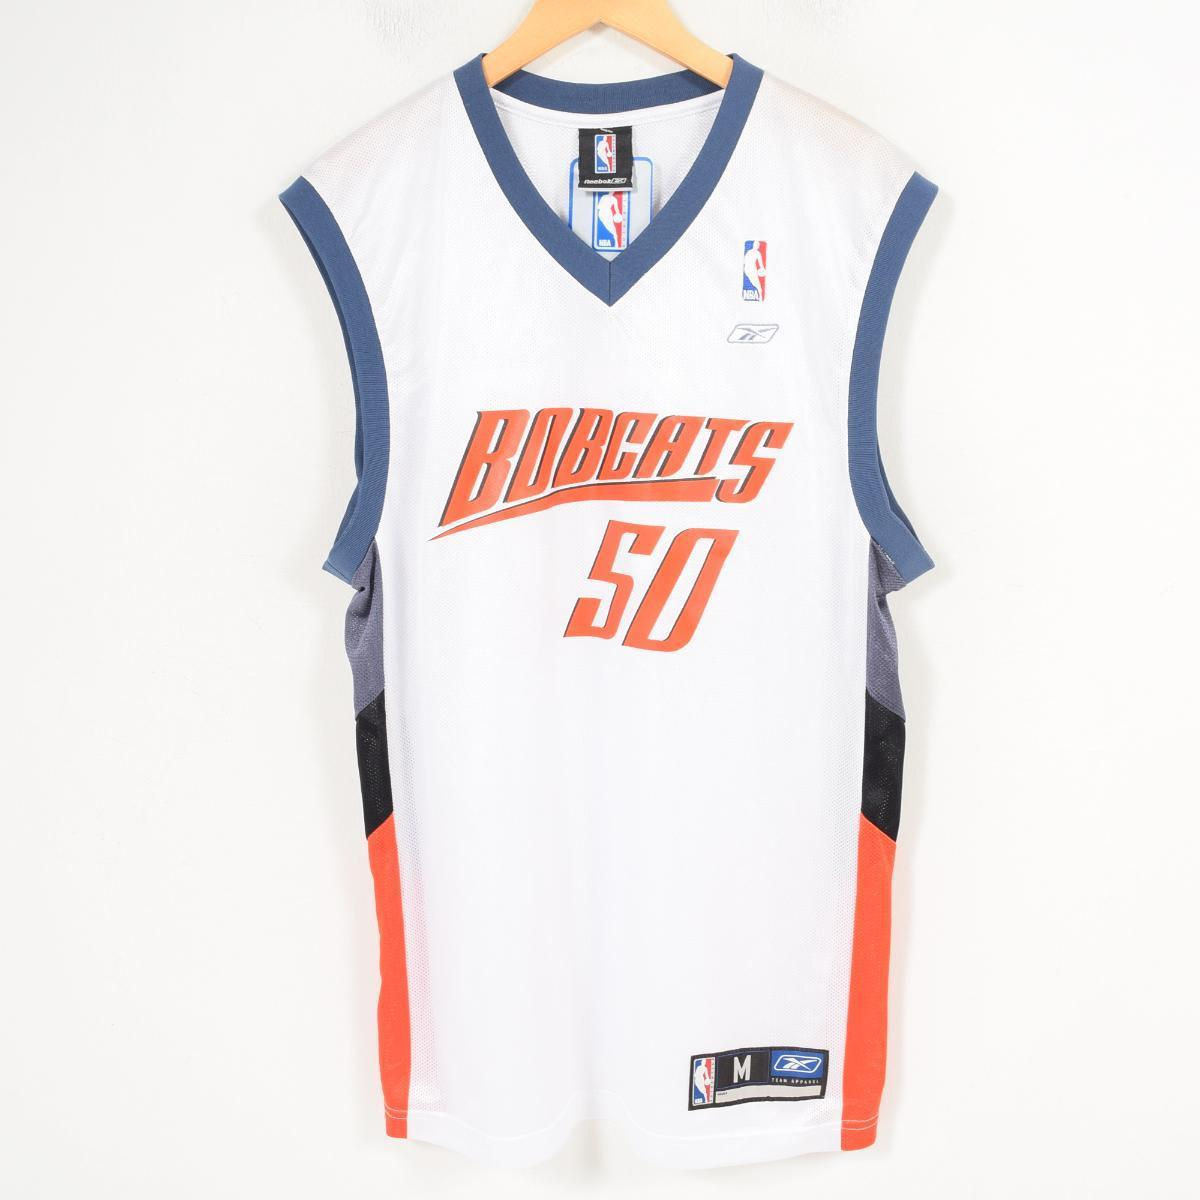 promo code 0fc8f f40c3 DEADSTOCK dead stock Reebok Reebok NBA CHARLOTTE BOBCSTS Charlotte Bobcats  game shirt replica uniform men M /wap0661